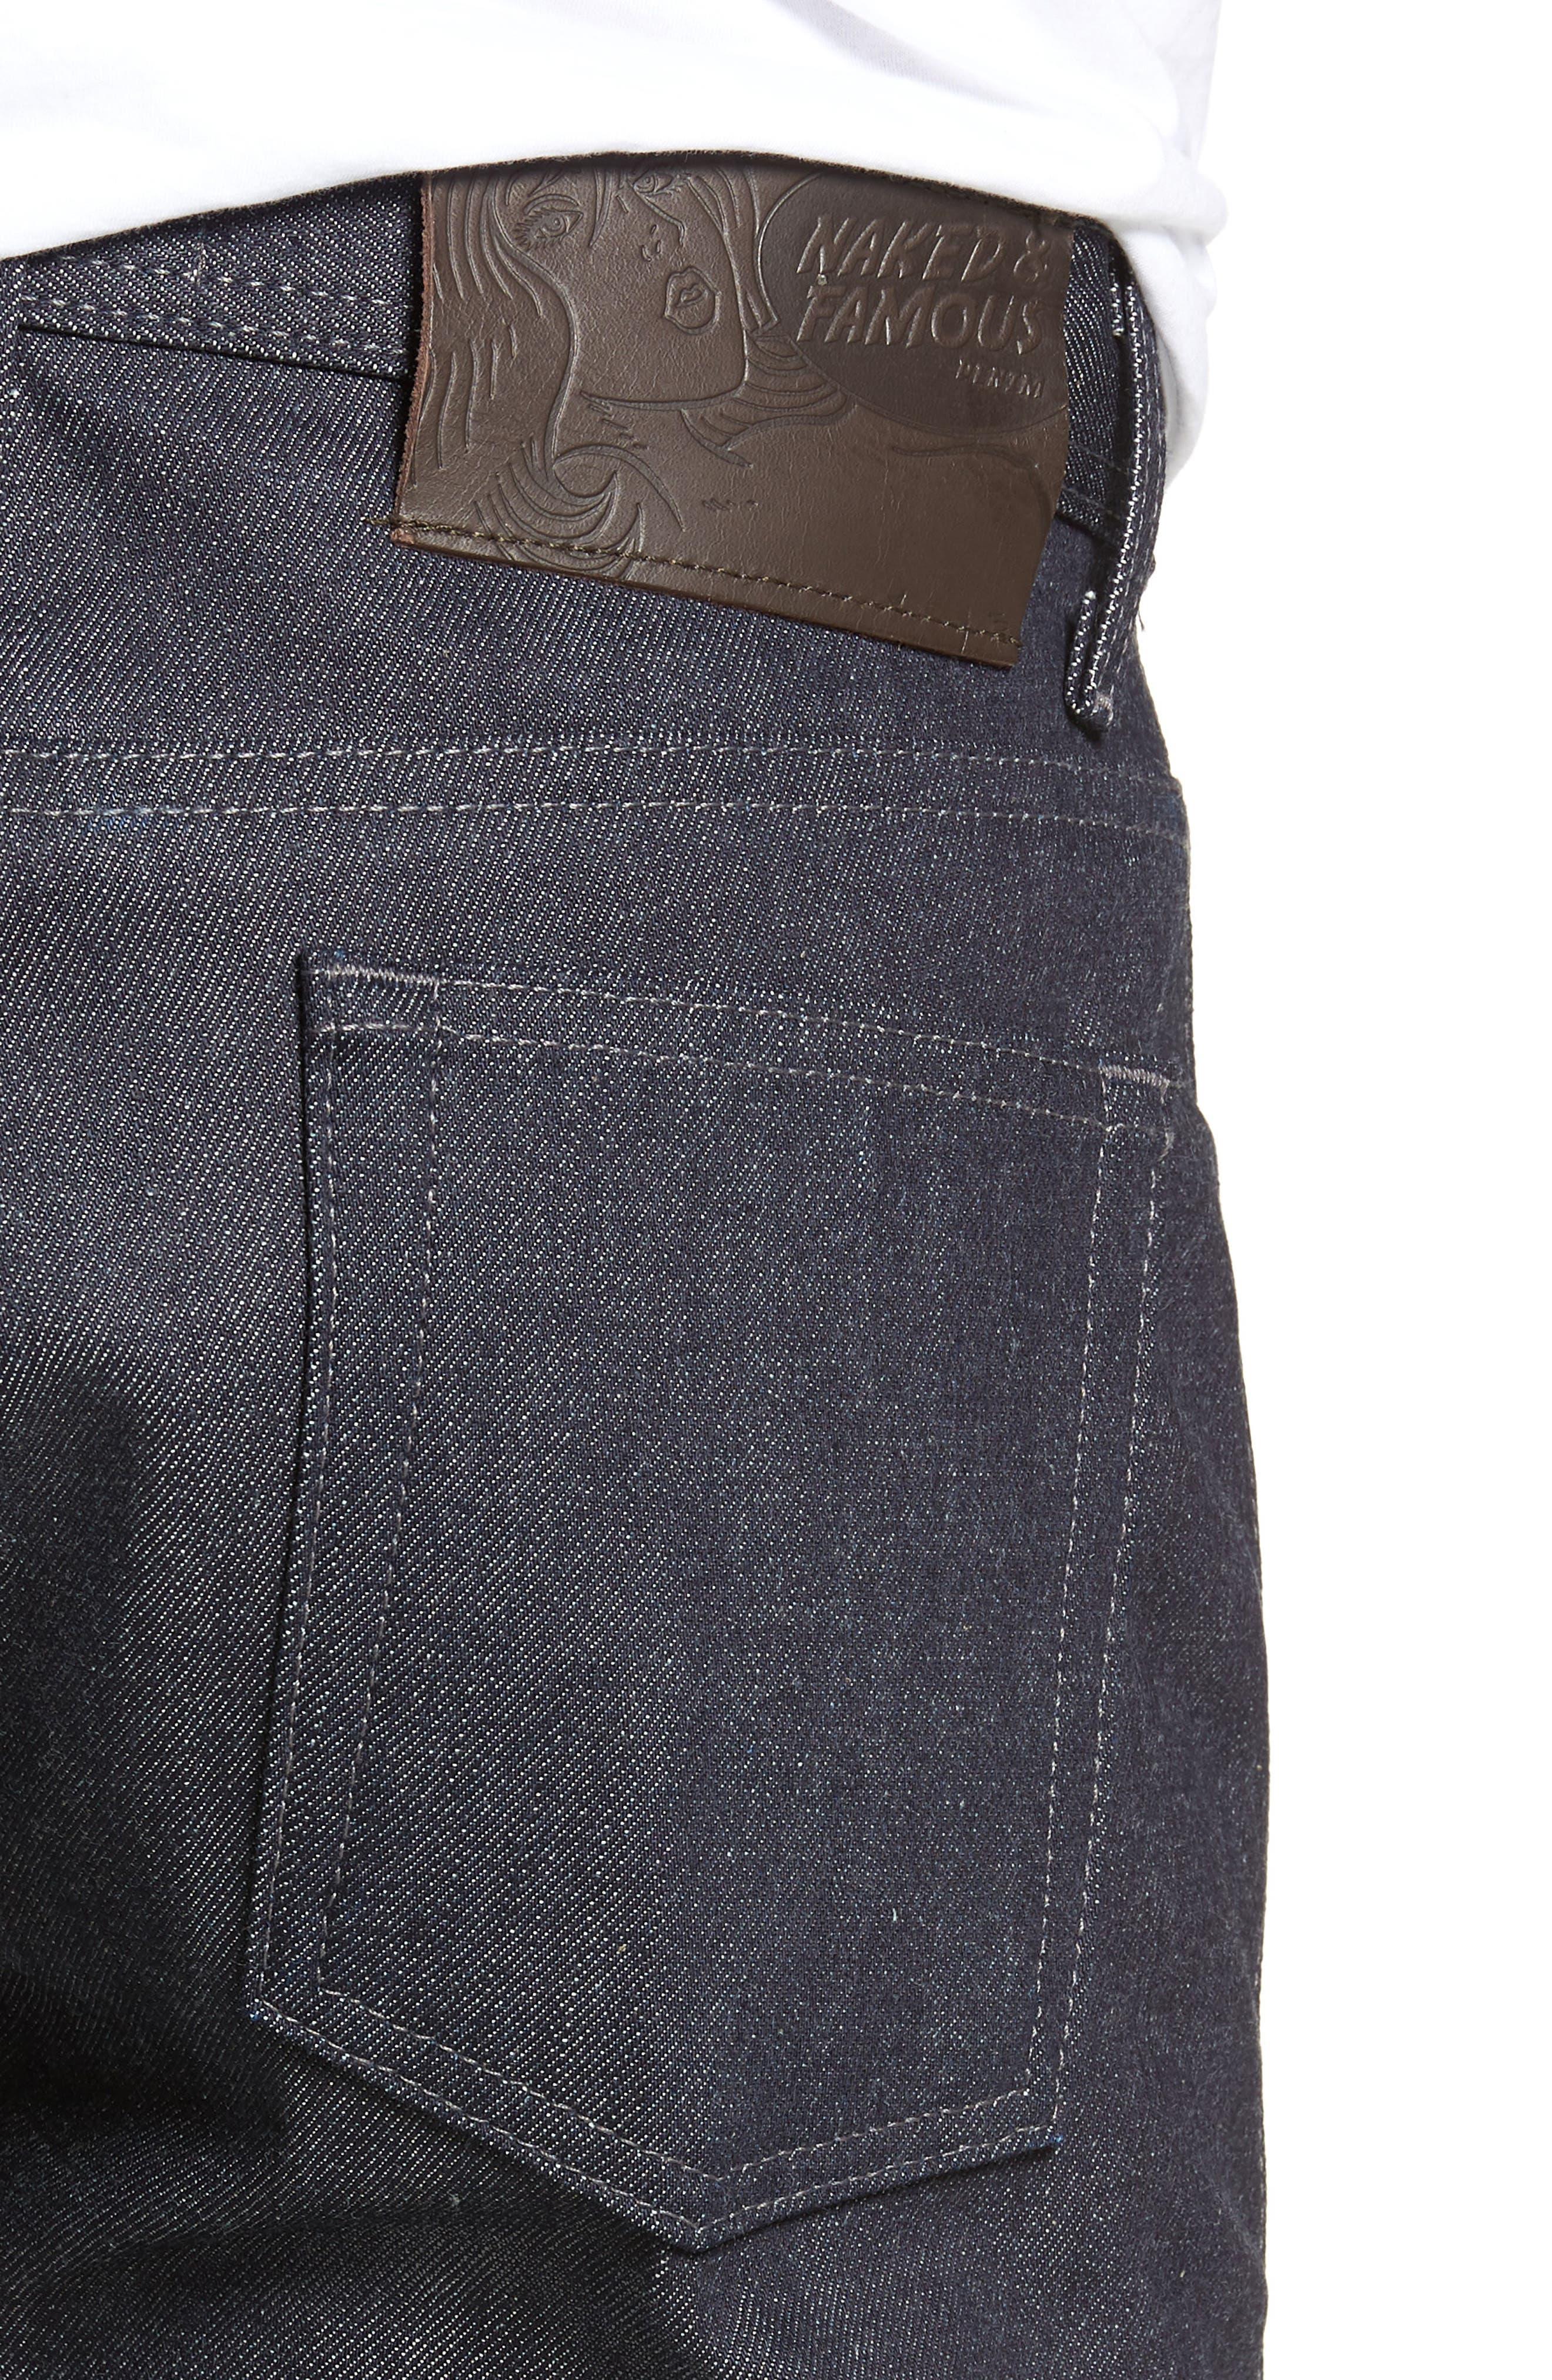 'Weird Guy' Slim Fit Selvedge Jeans,                             Alternate thumbnail 4, color,                             INDIGO